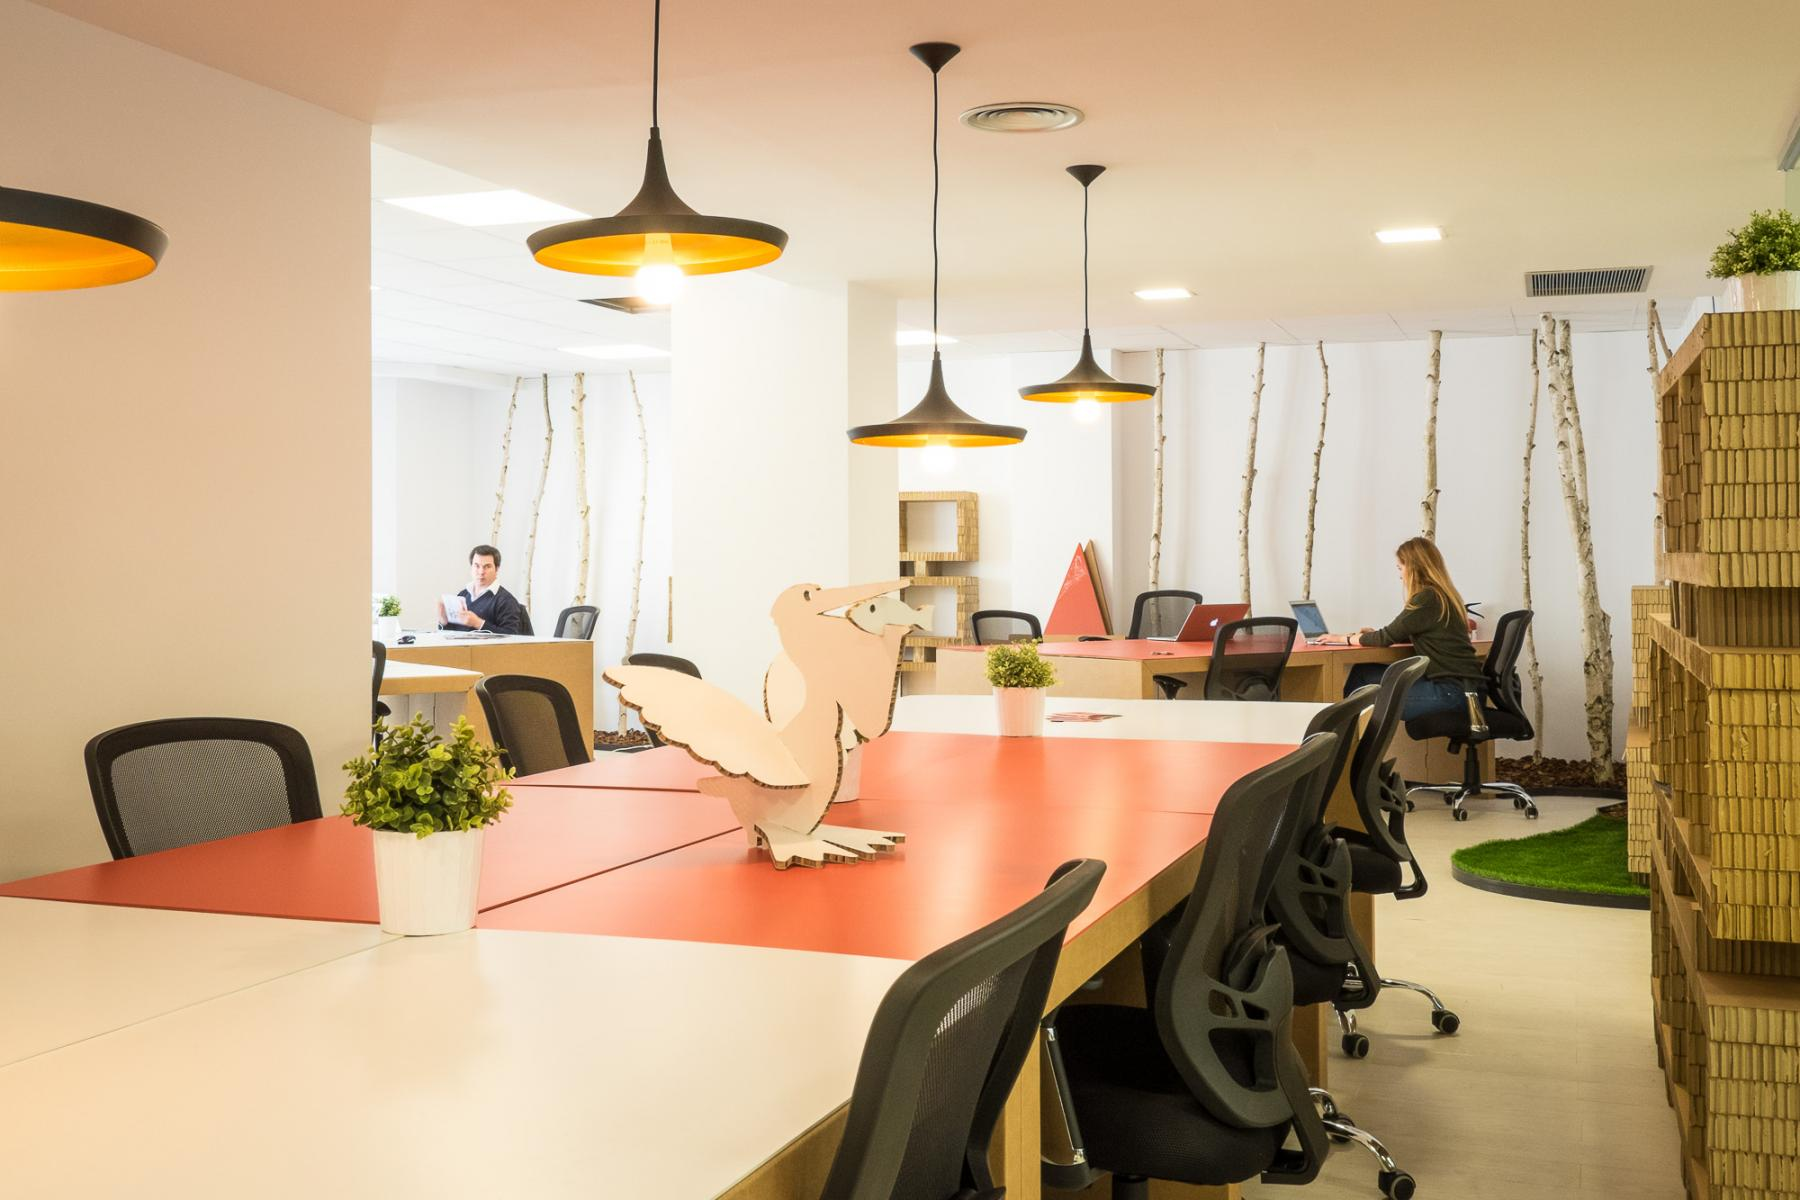 Alquilar oficinas Carrer de Muntaner 3, Barcelona (1)